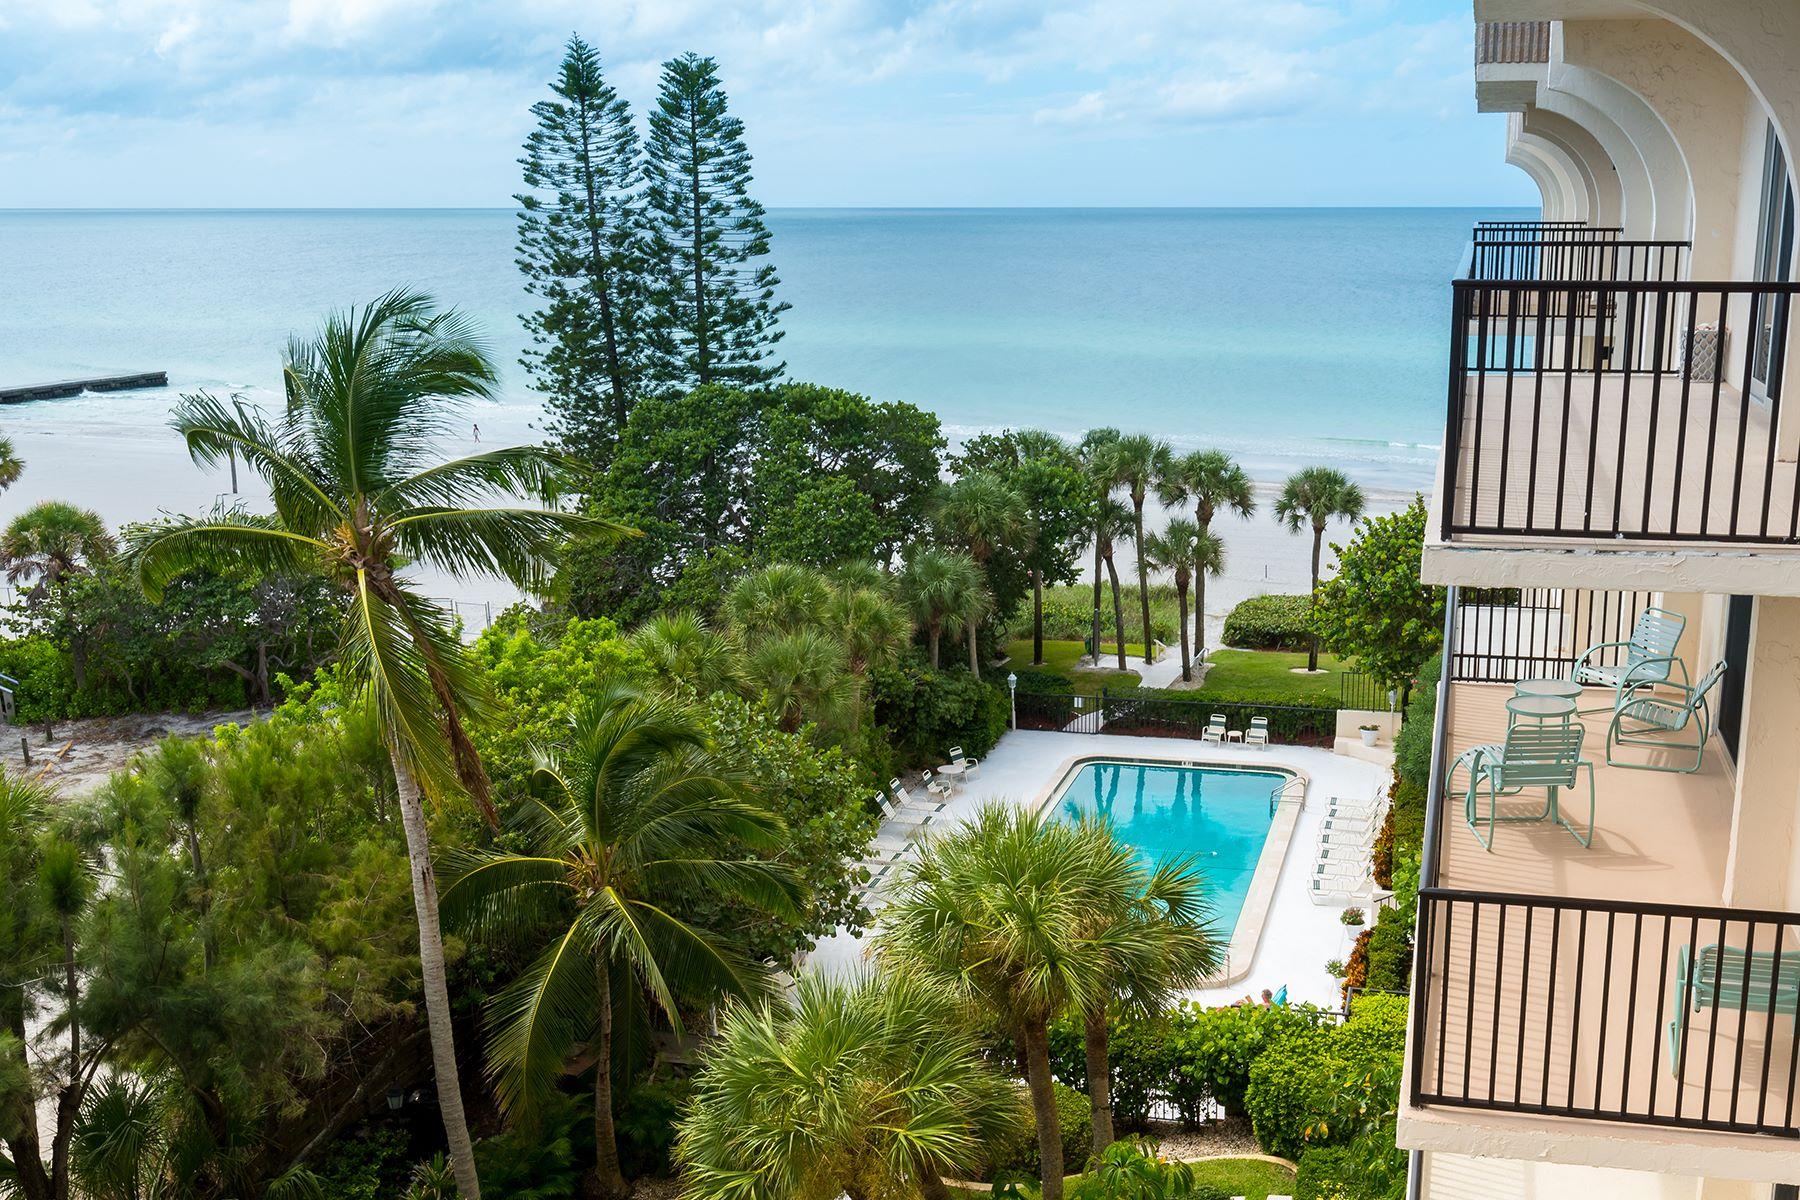 Condominium for Sale at LONGBOAT KEY 1701 Gulf Of Mexico Dr 604 Longboat Key, Florida, 34228 United States